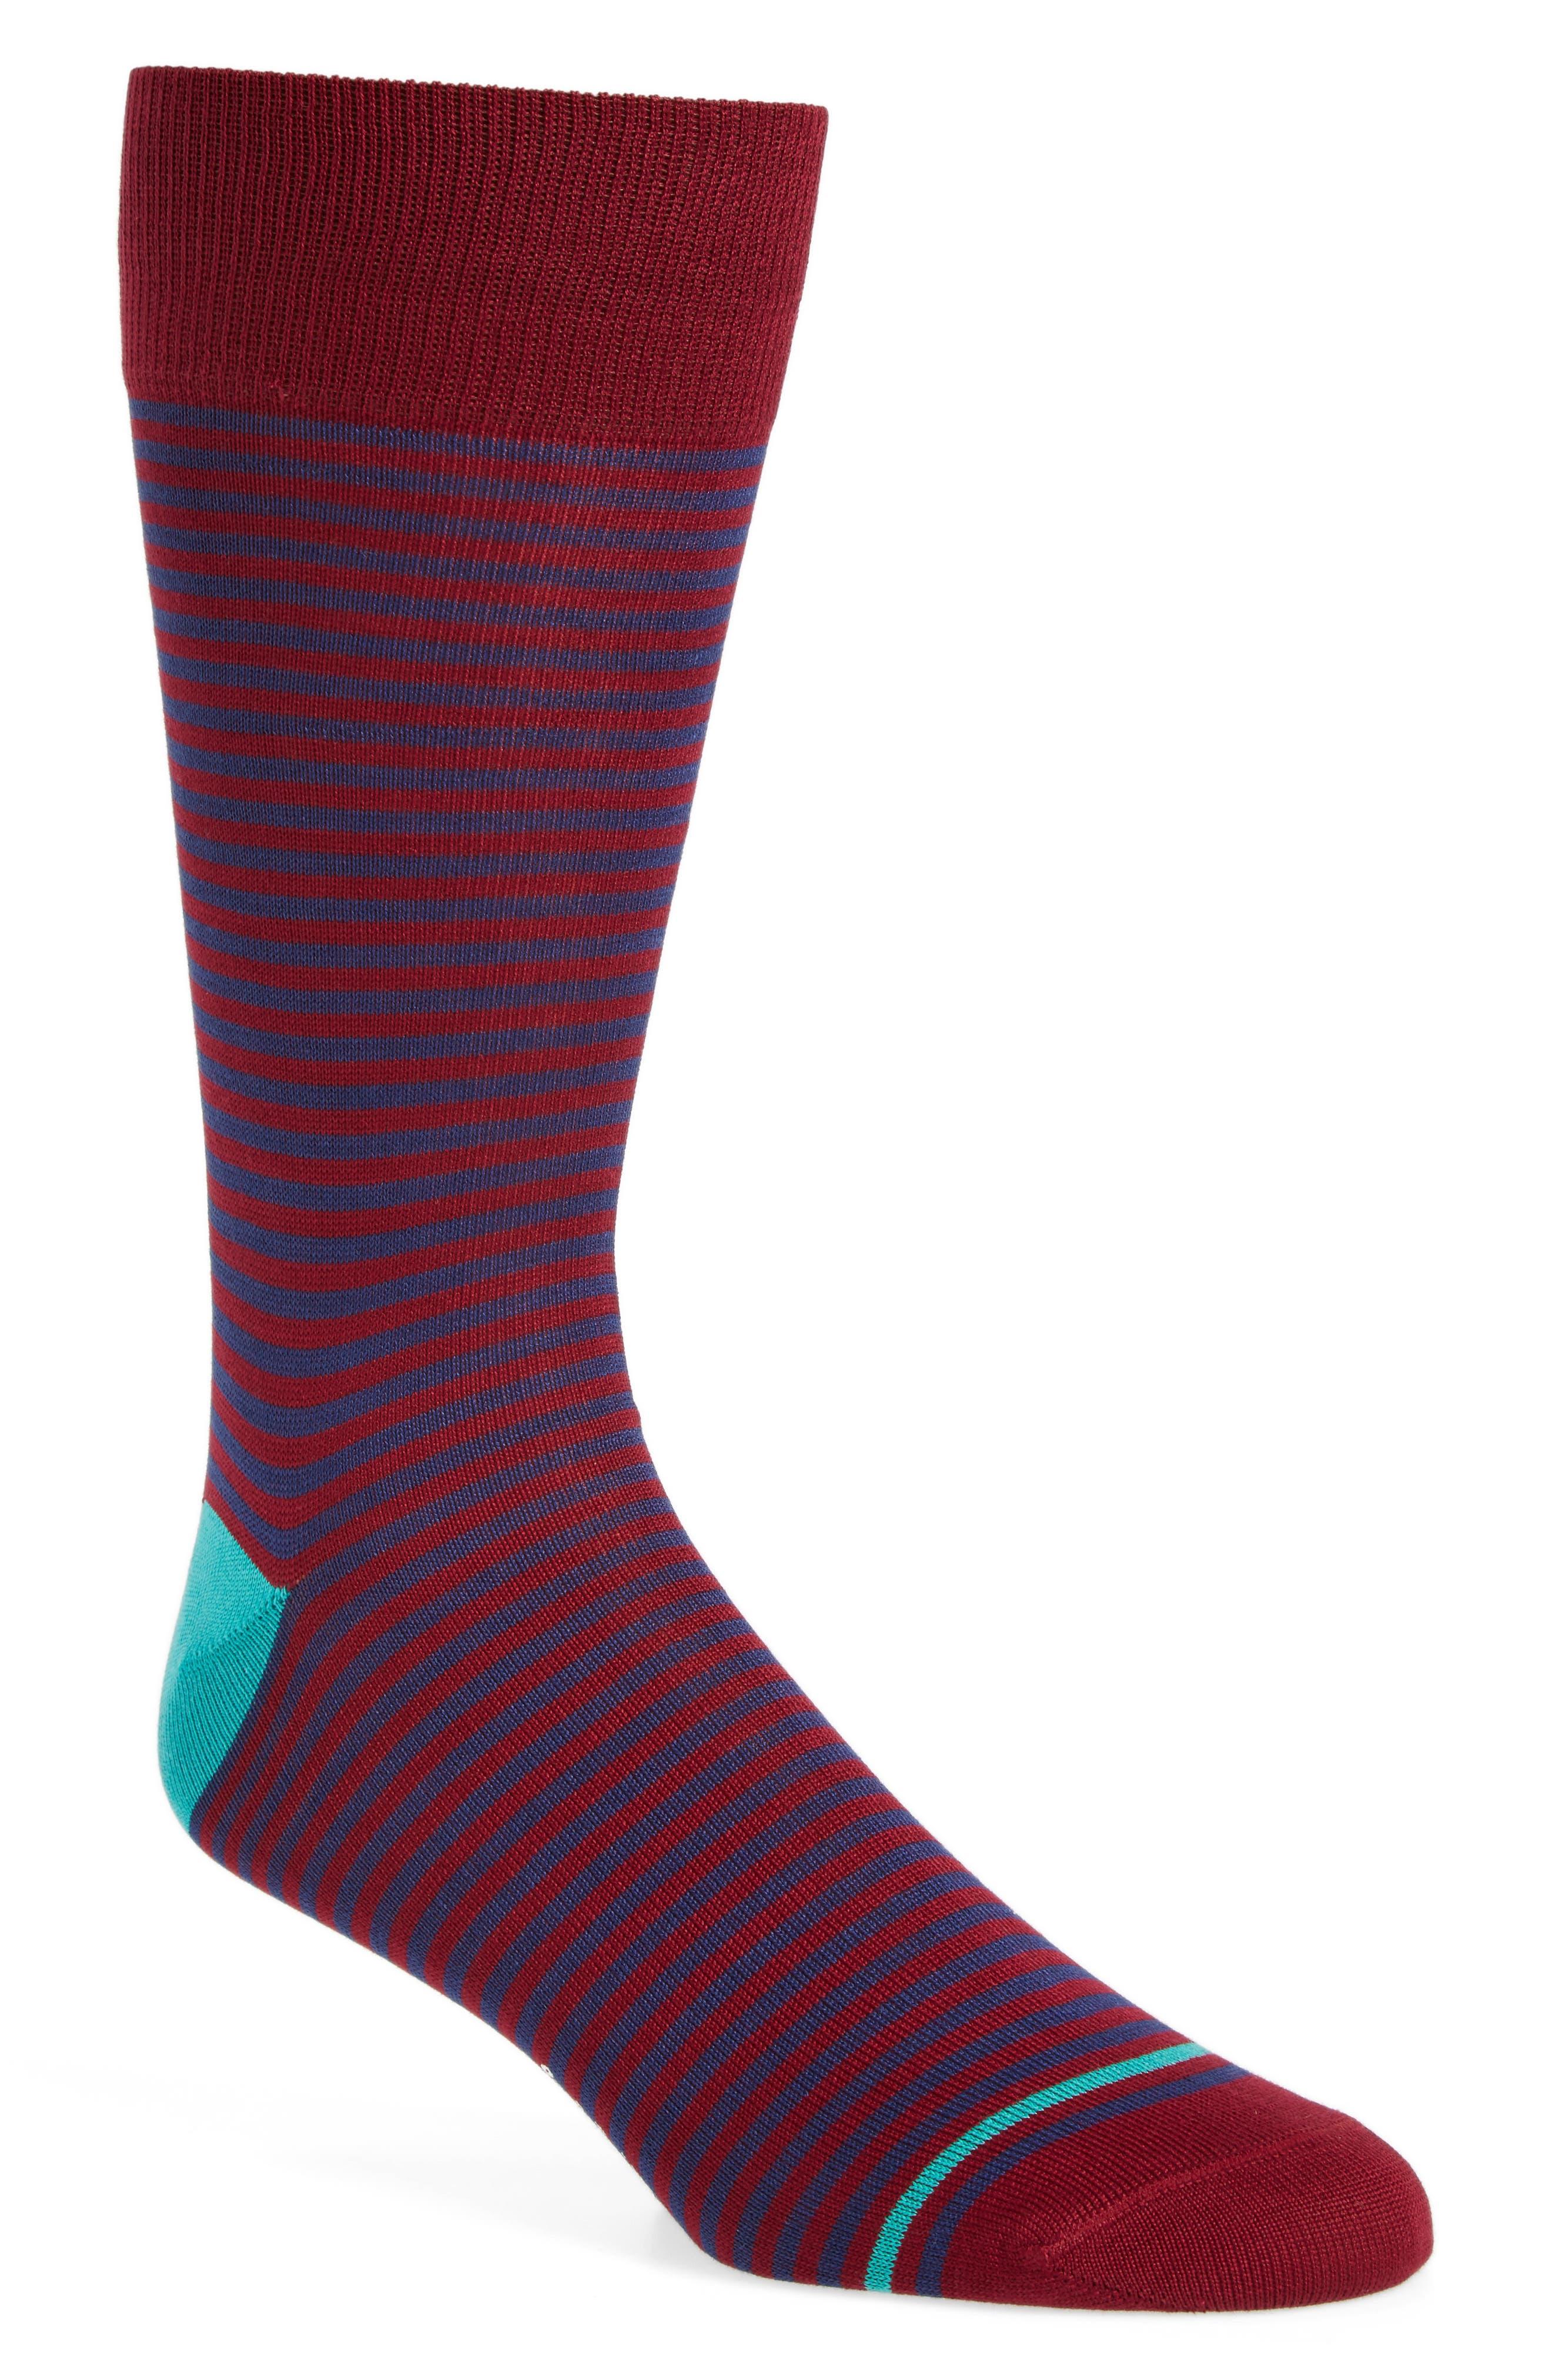 Main Image - Paul Smith Marsden Stripe Socks